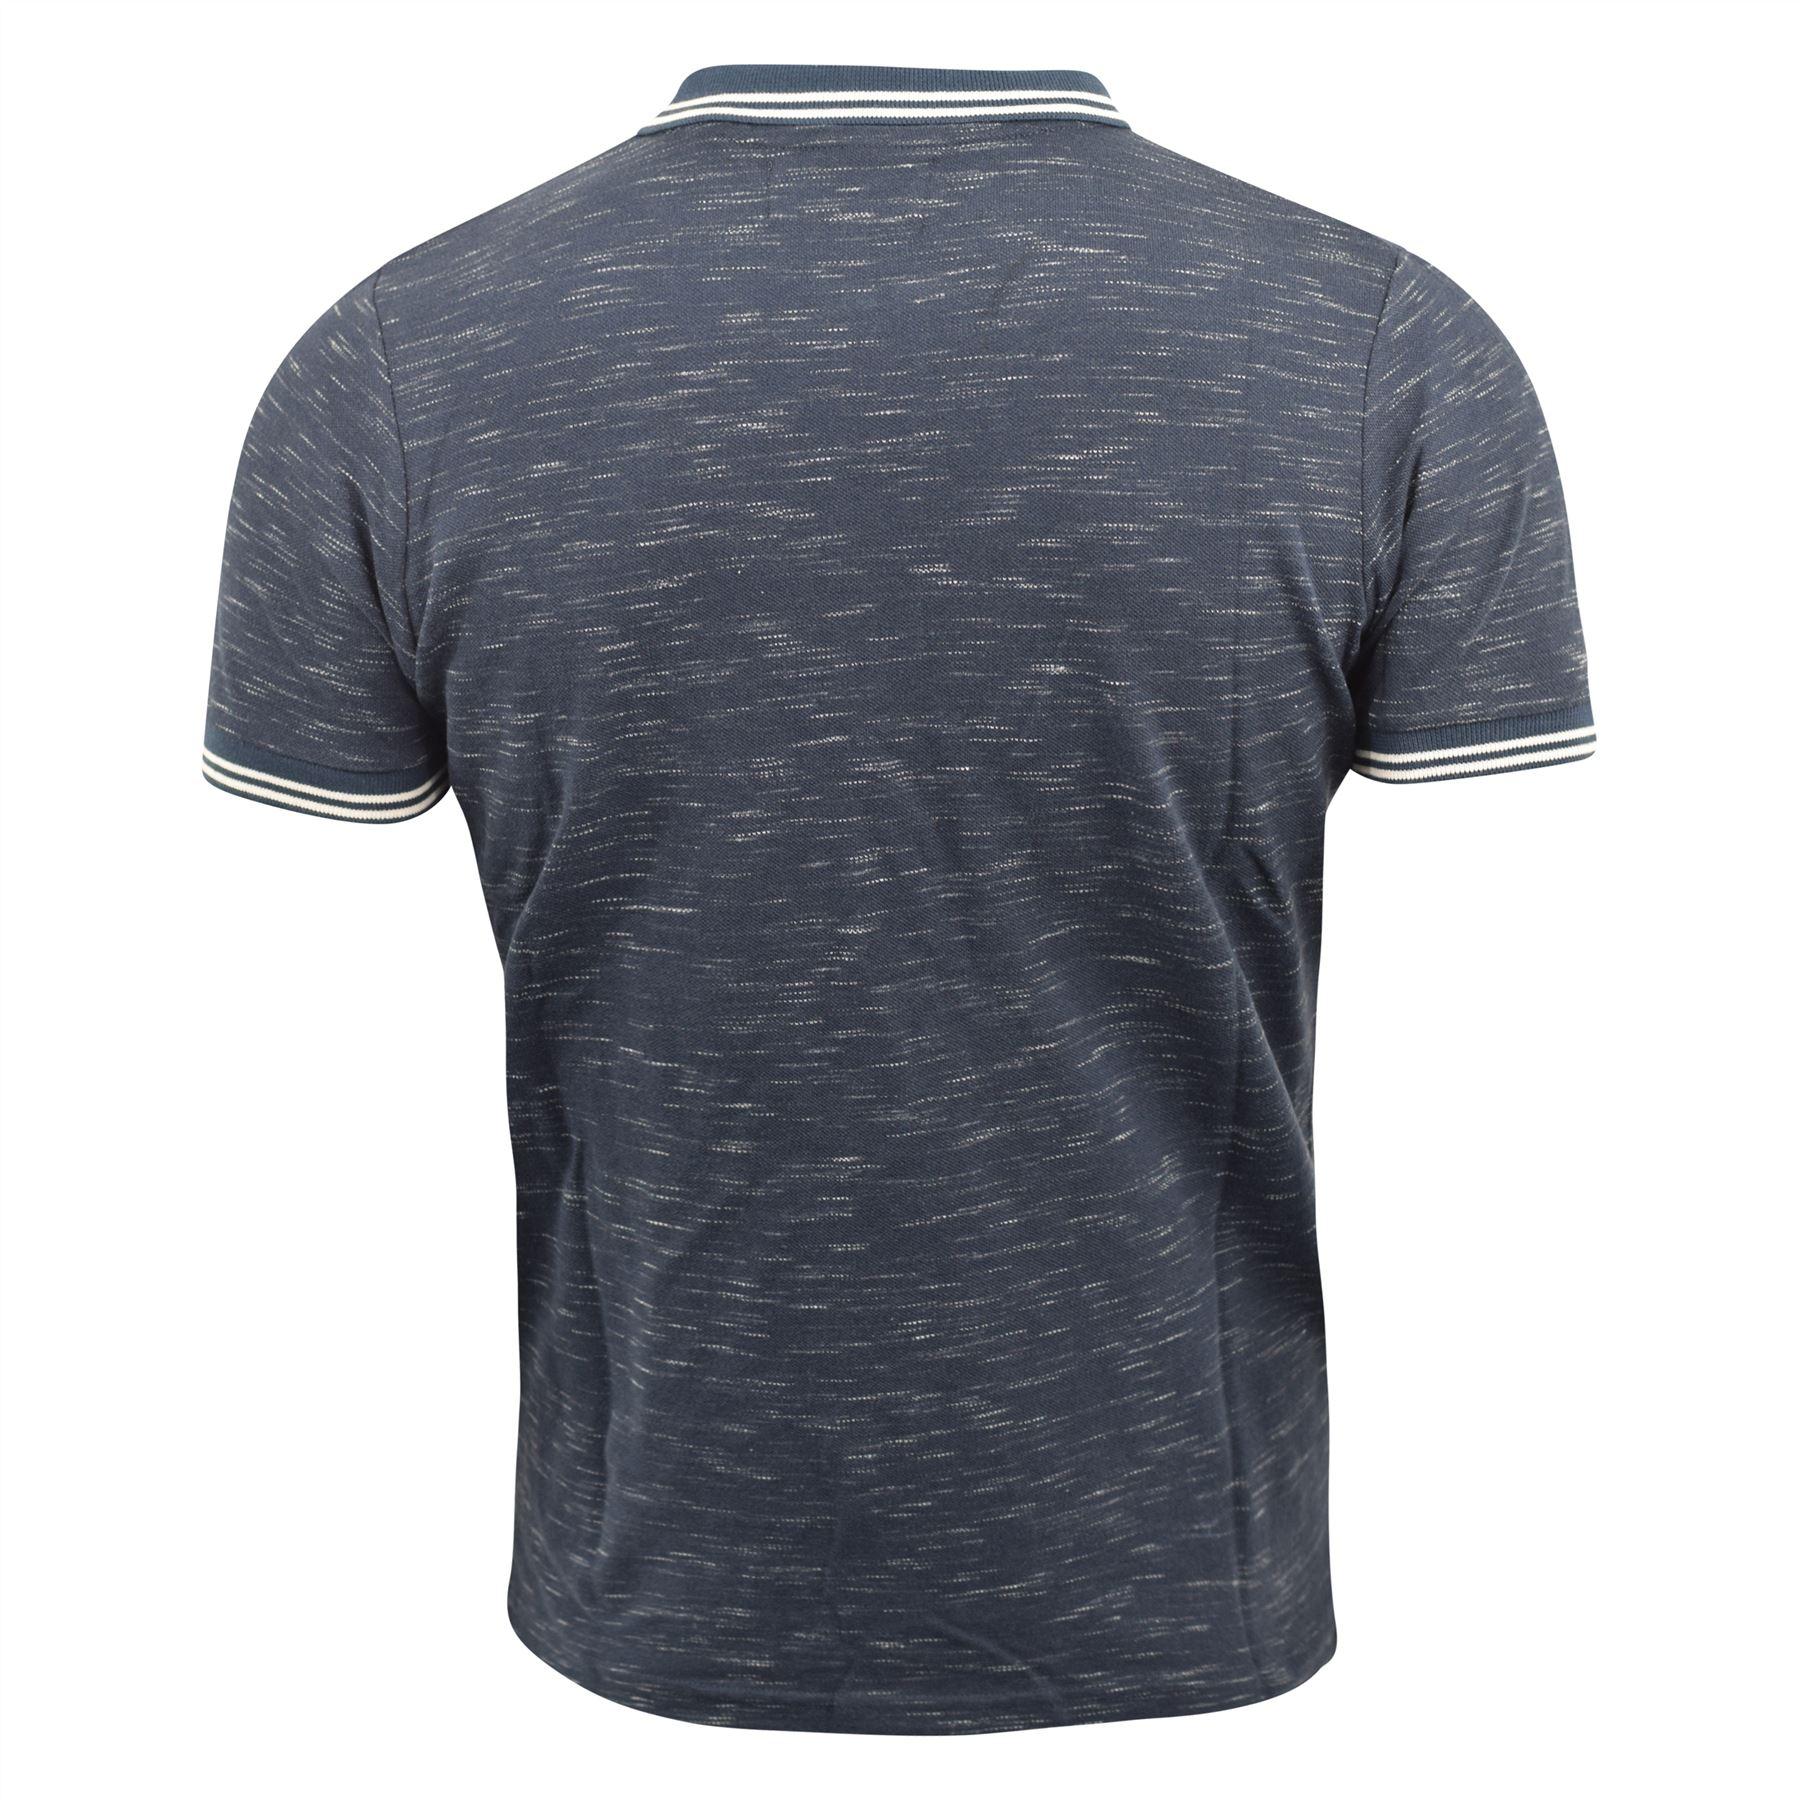 Mens-Polo-Shirt-kangol-Short-Sleeve-T-Shirt-Top-Jack thumbnail 7